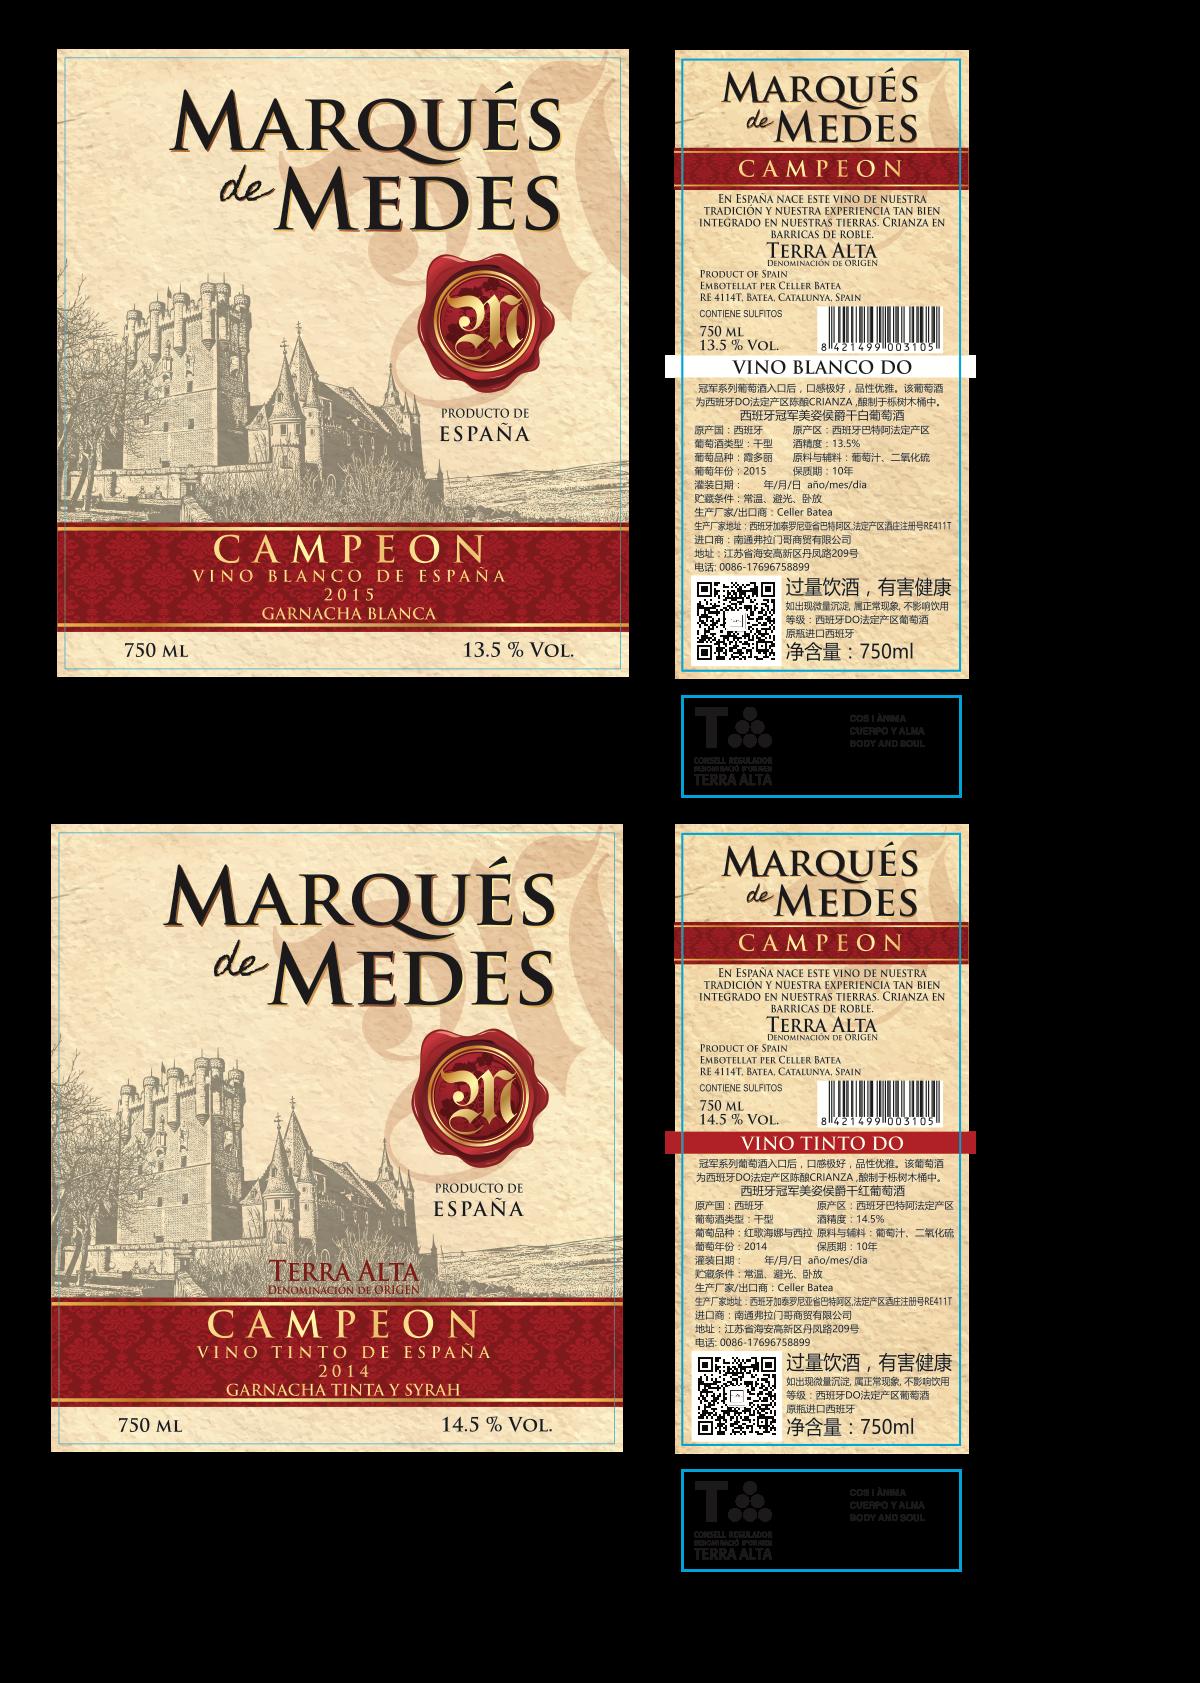 Modifications for Marques de Medes